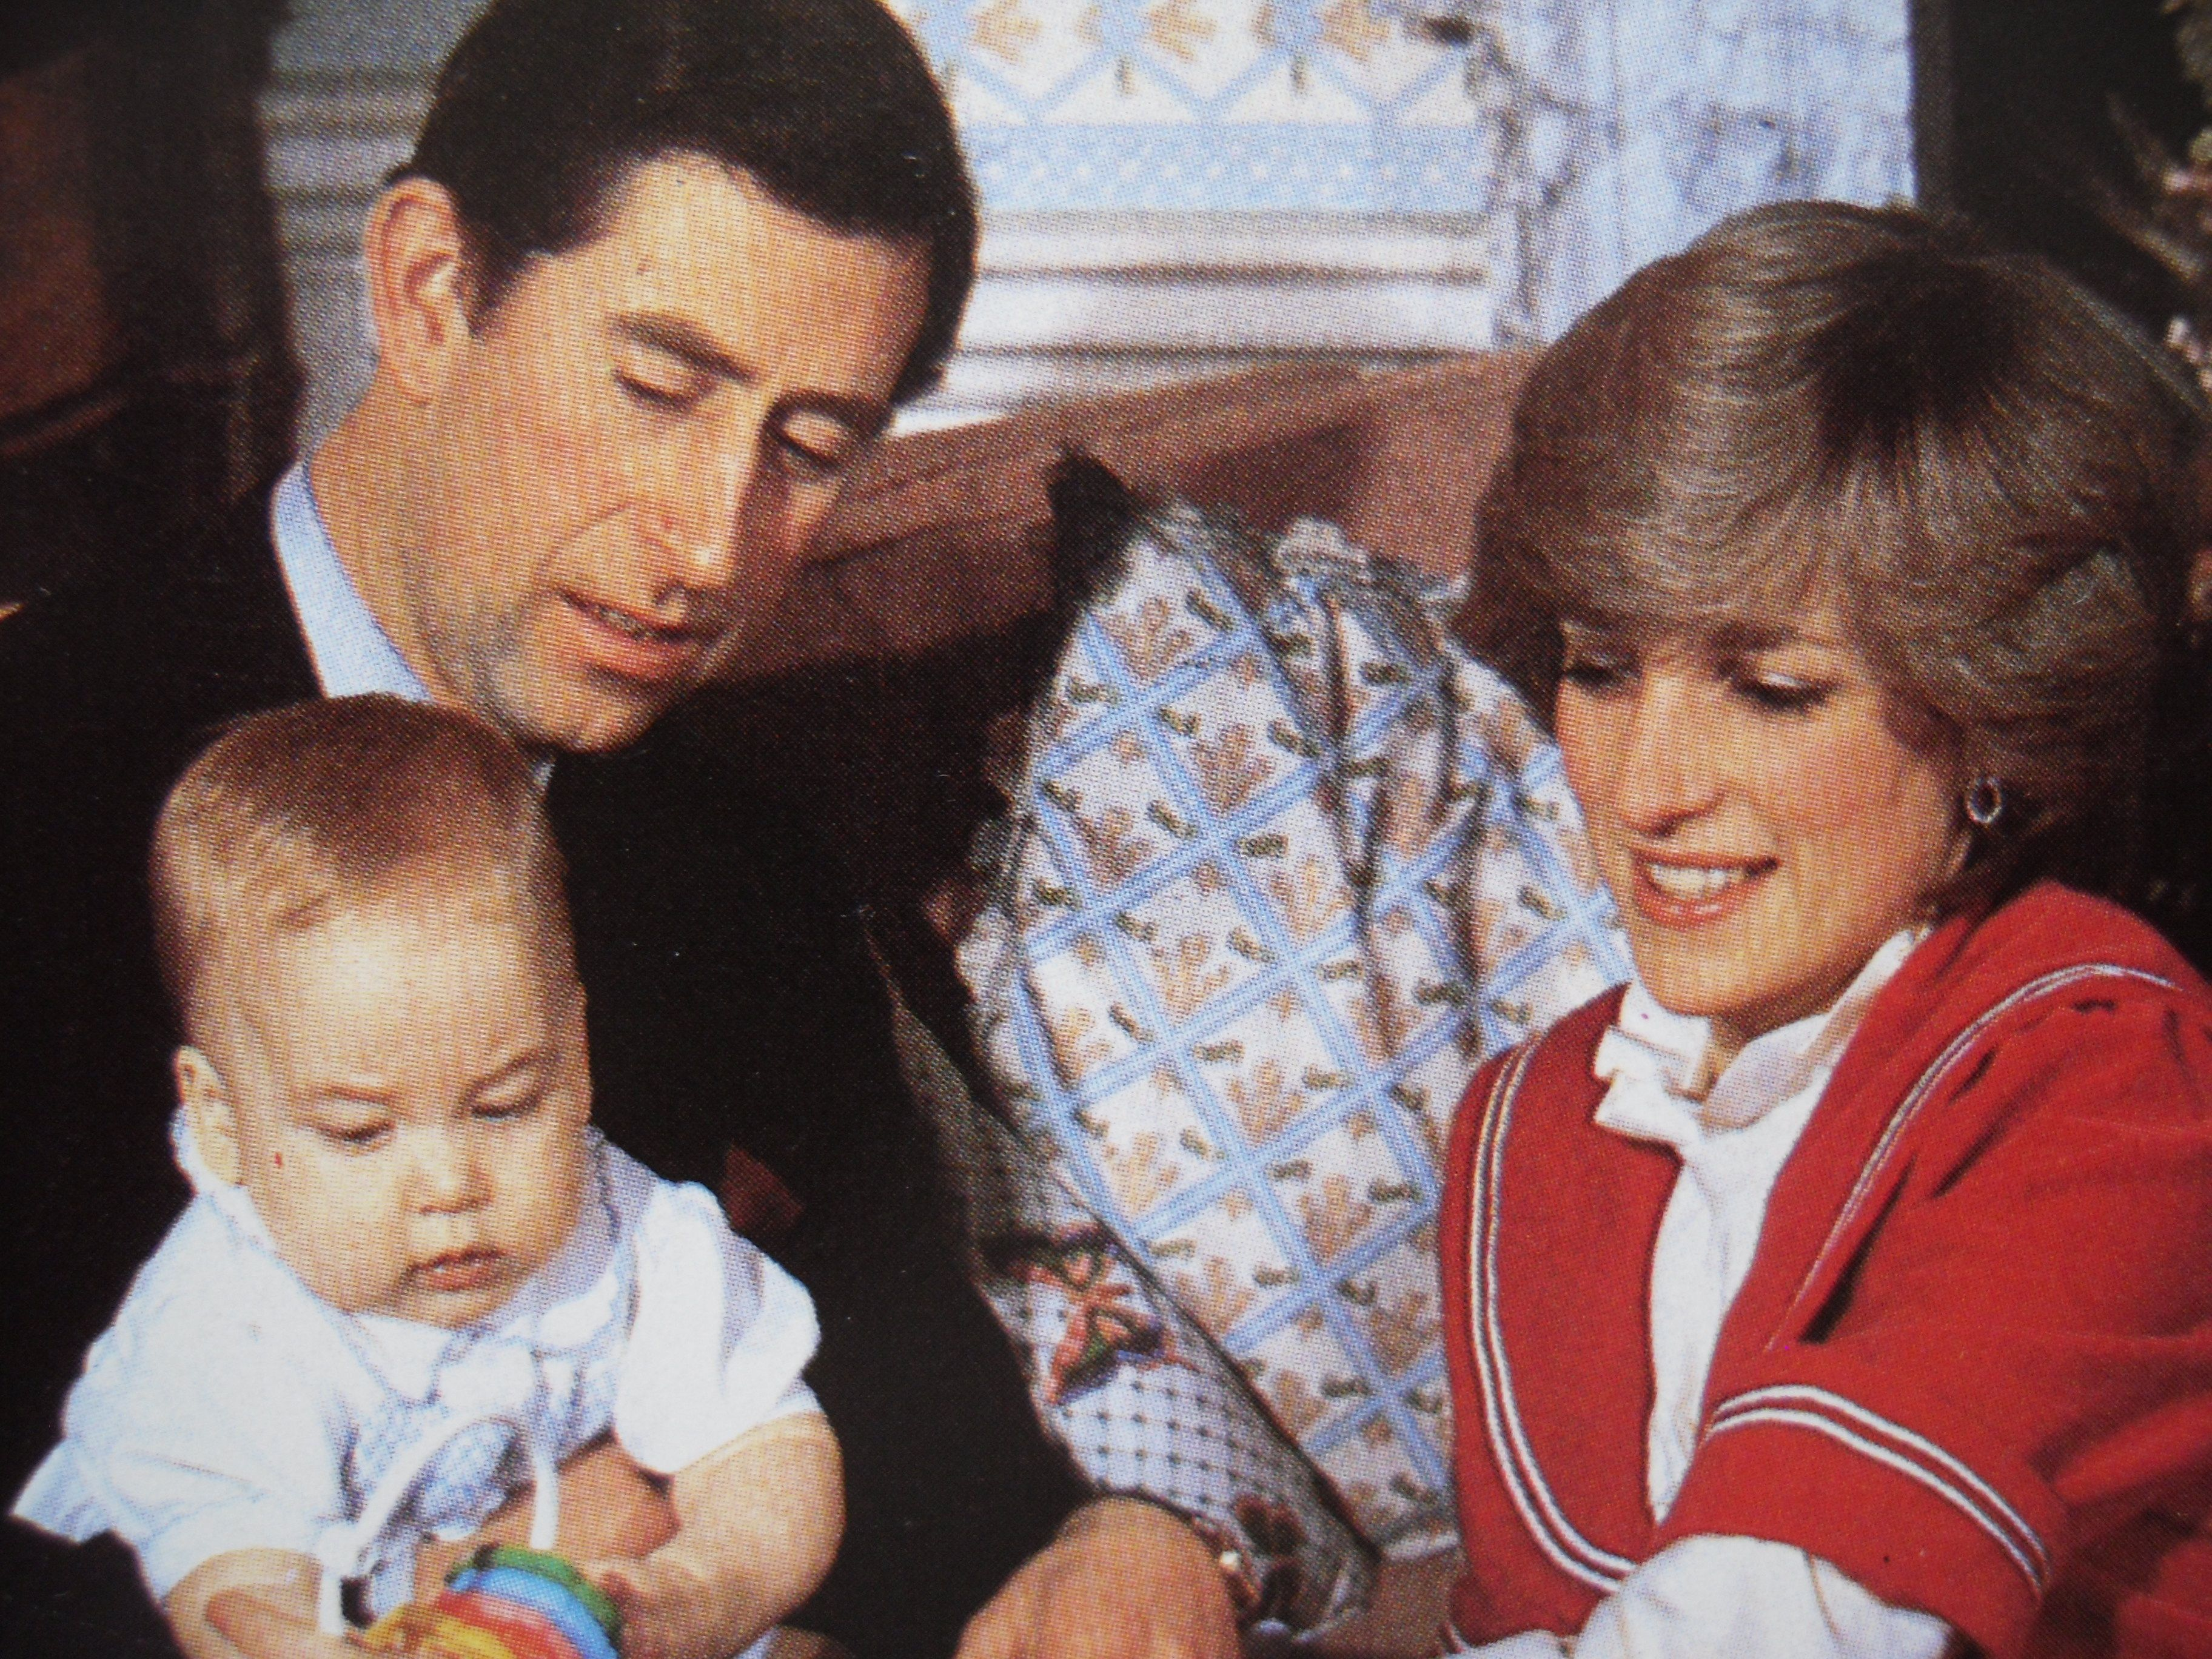 Charles & Diana & William